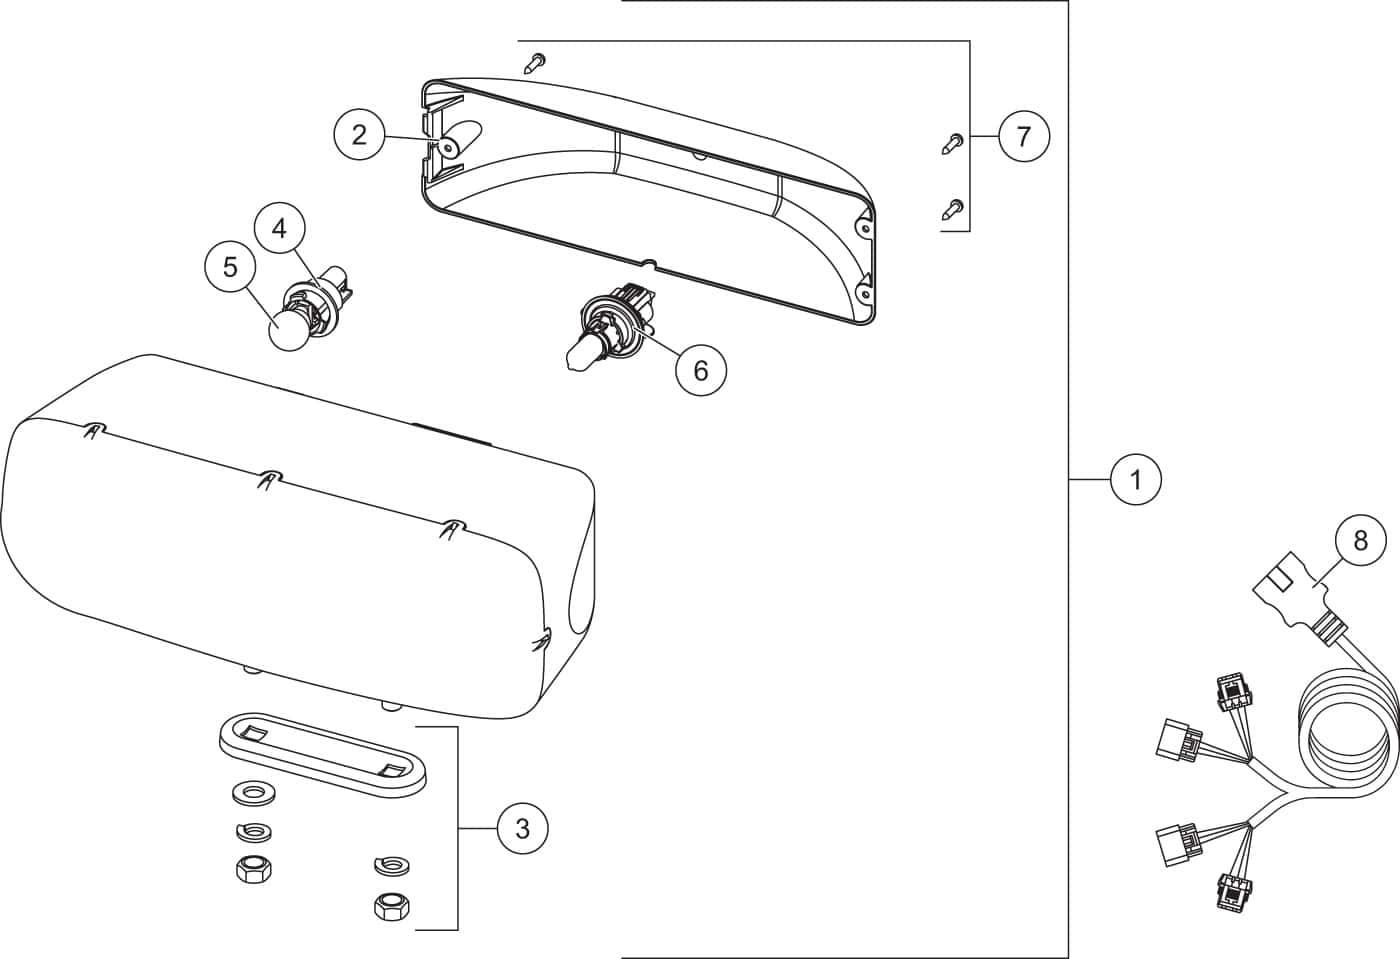 xv2hlk?resize\\\=665%2C456\\\&ssl\\\=1 1206 controller wiring diagram controller cable, controller curtis 1206 wiring diagram at soozxer.org